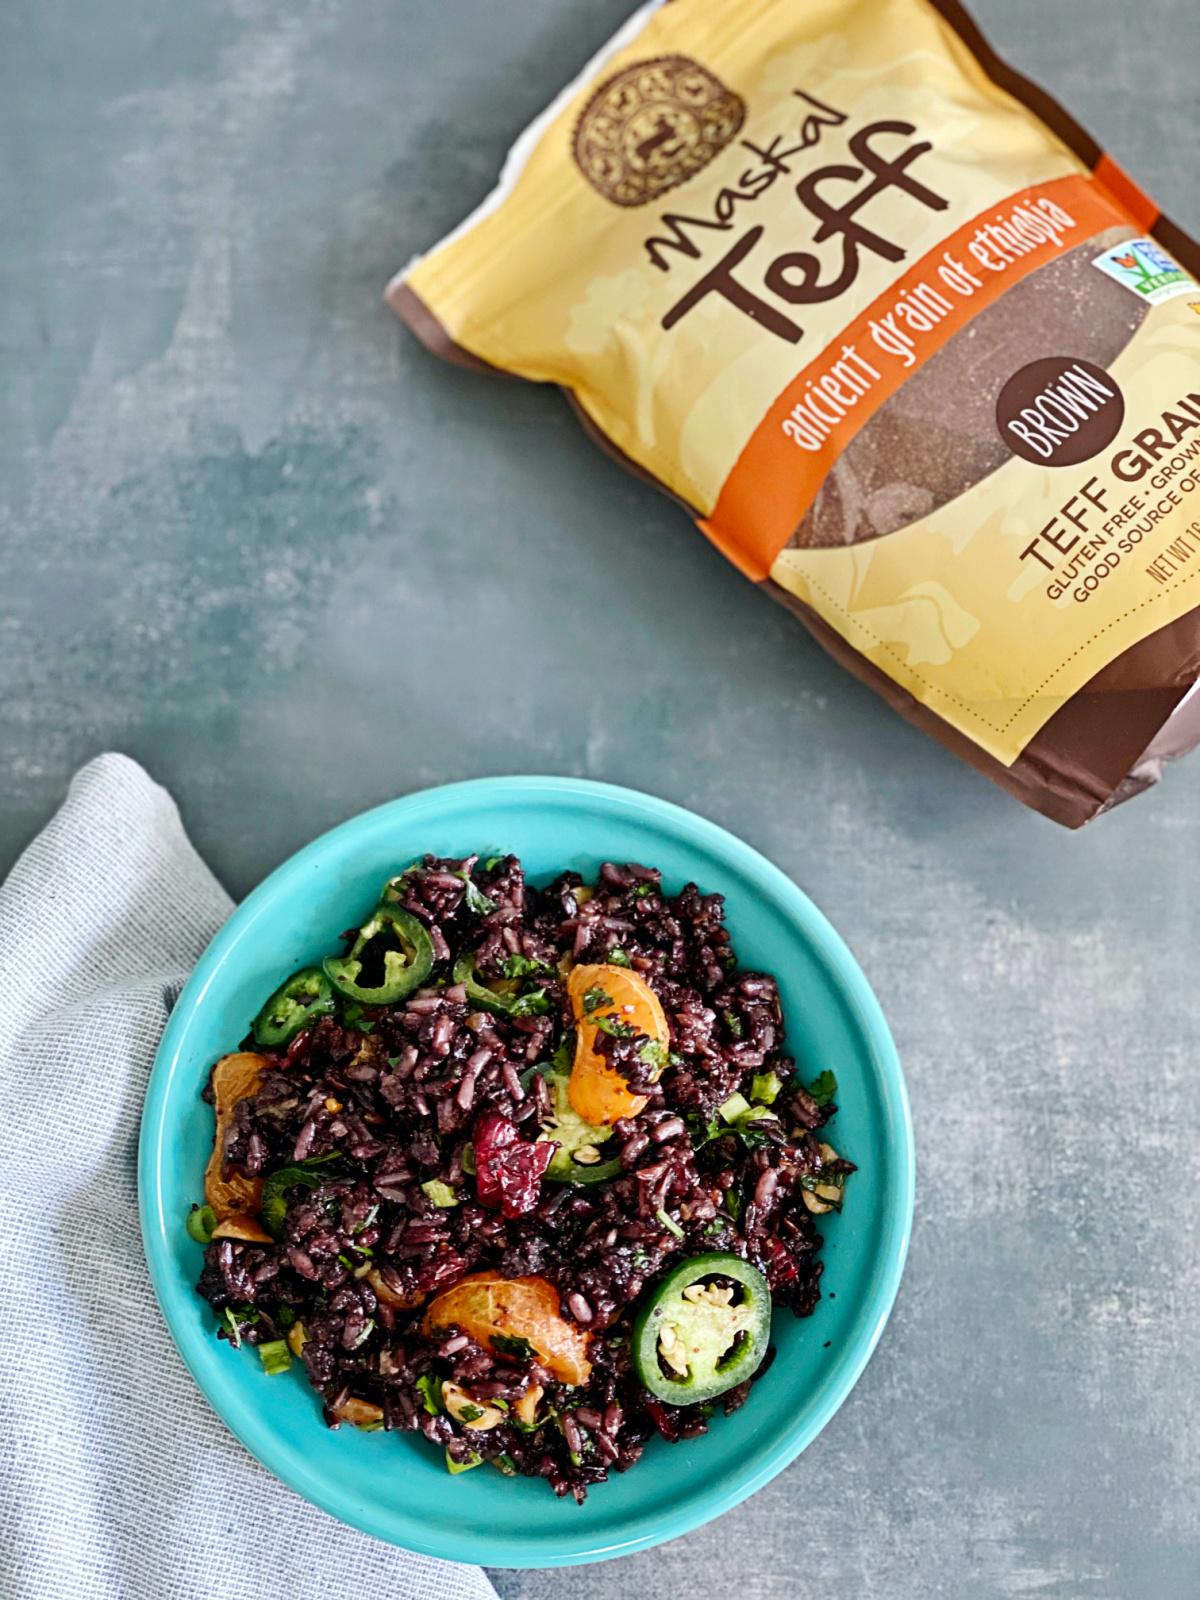 Teff and Black Rice Salad | Julie's Kitchenette